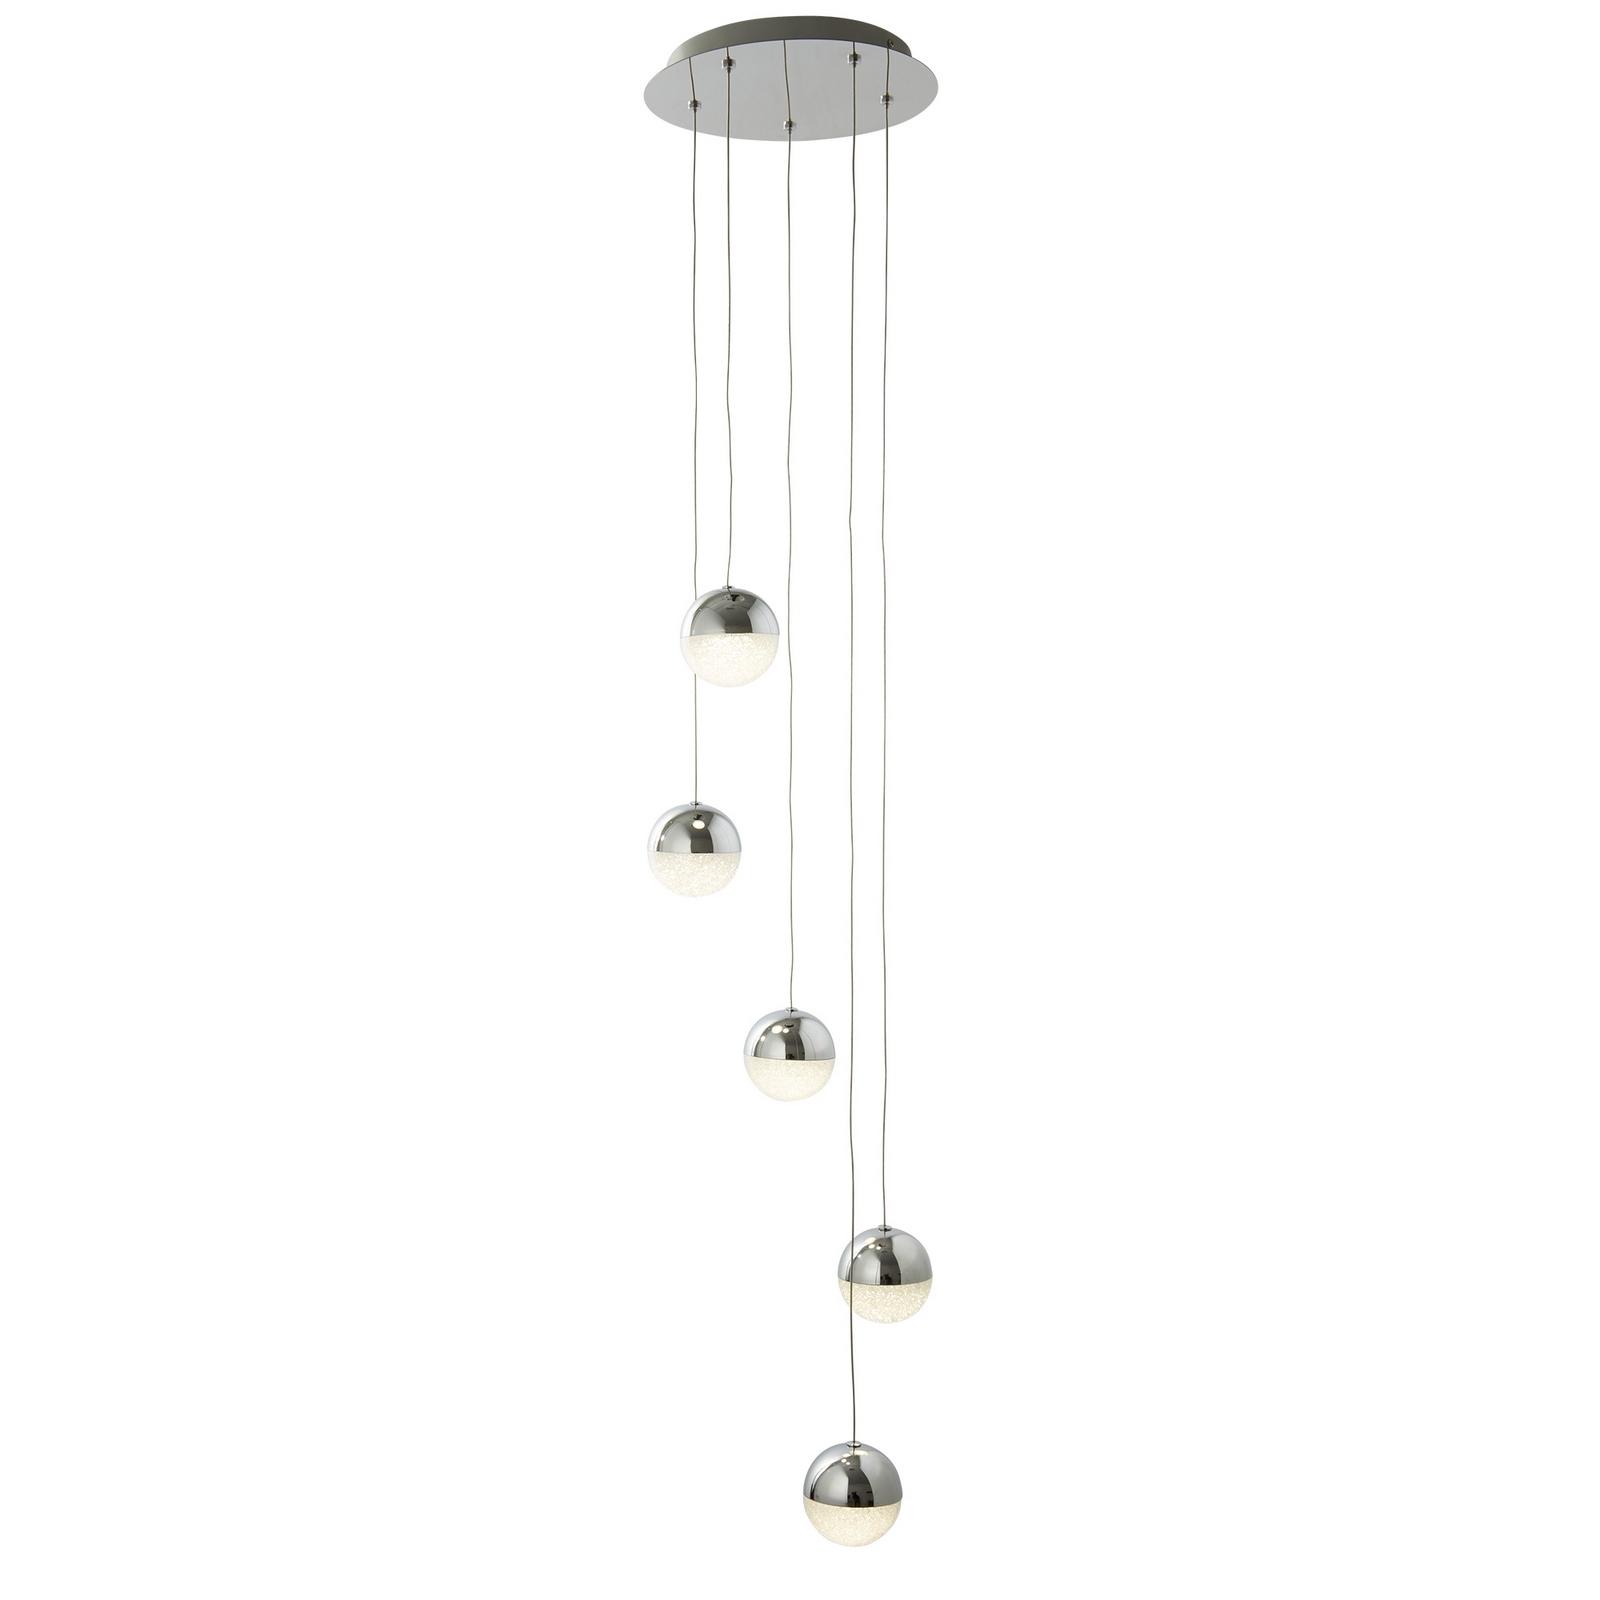 Marbles 5 light multi-drop pendant